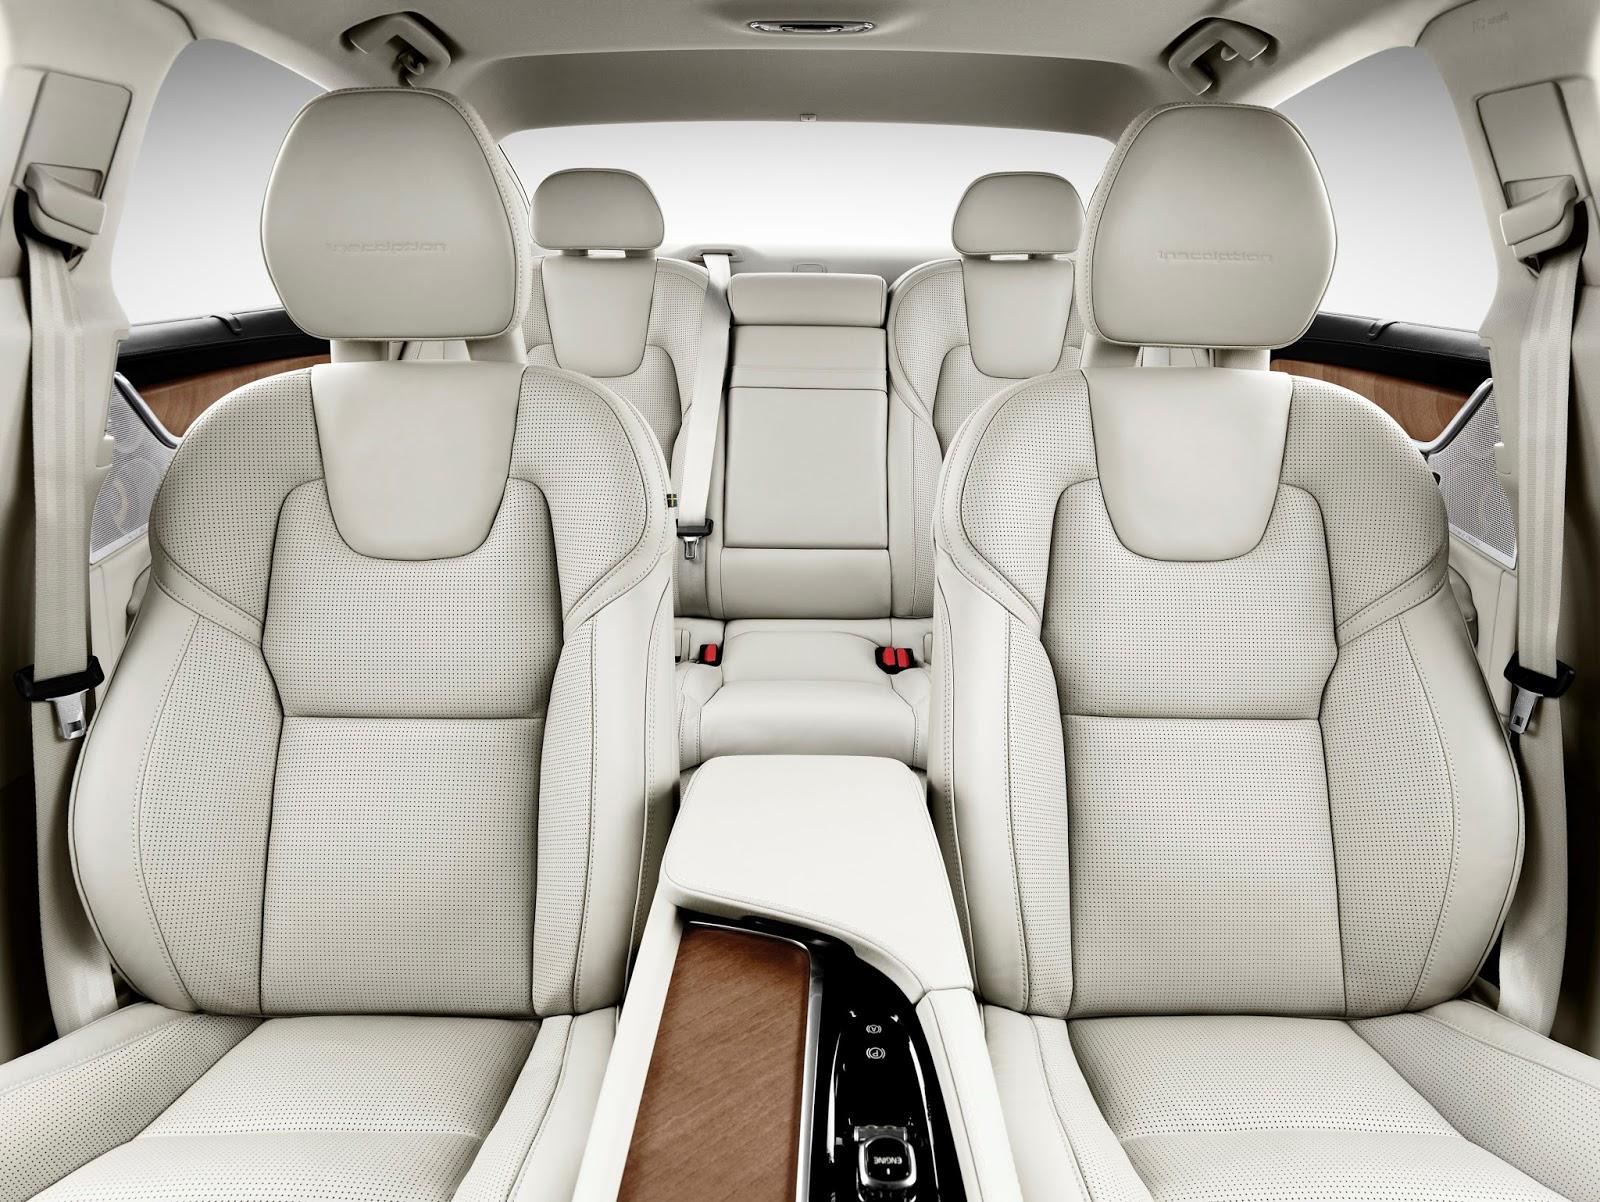 170132 Interior All Seats Volvo S90 Το νέο Volvo S90 έρχεται και βάζει φωτιά στον ανταγωνισμό premium sedan, Volvo, Volvo Cars, Volvo S90